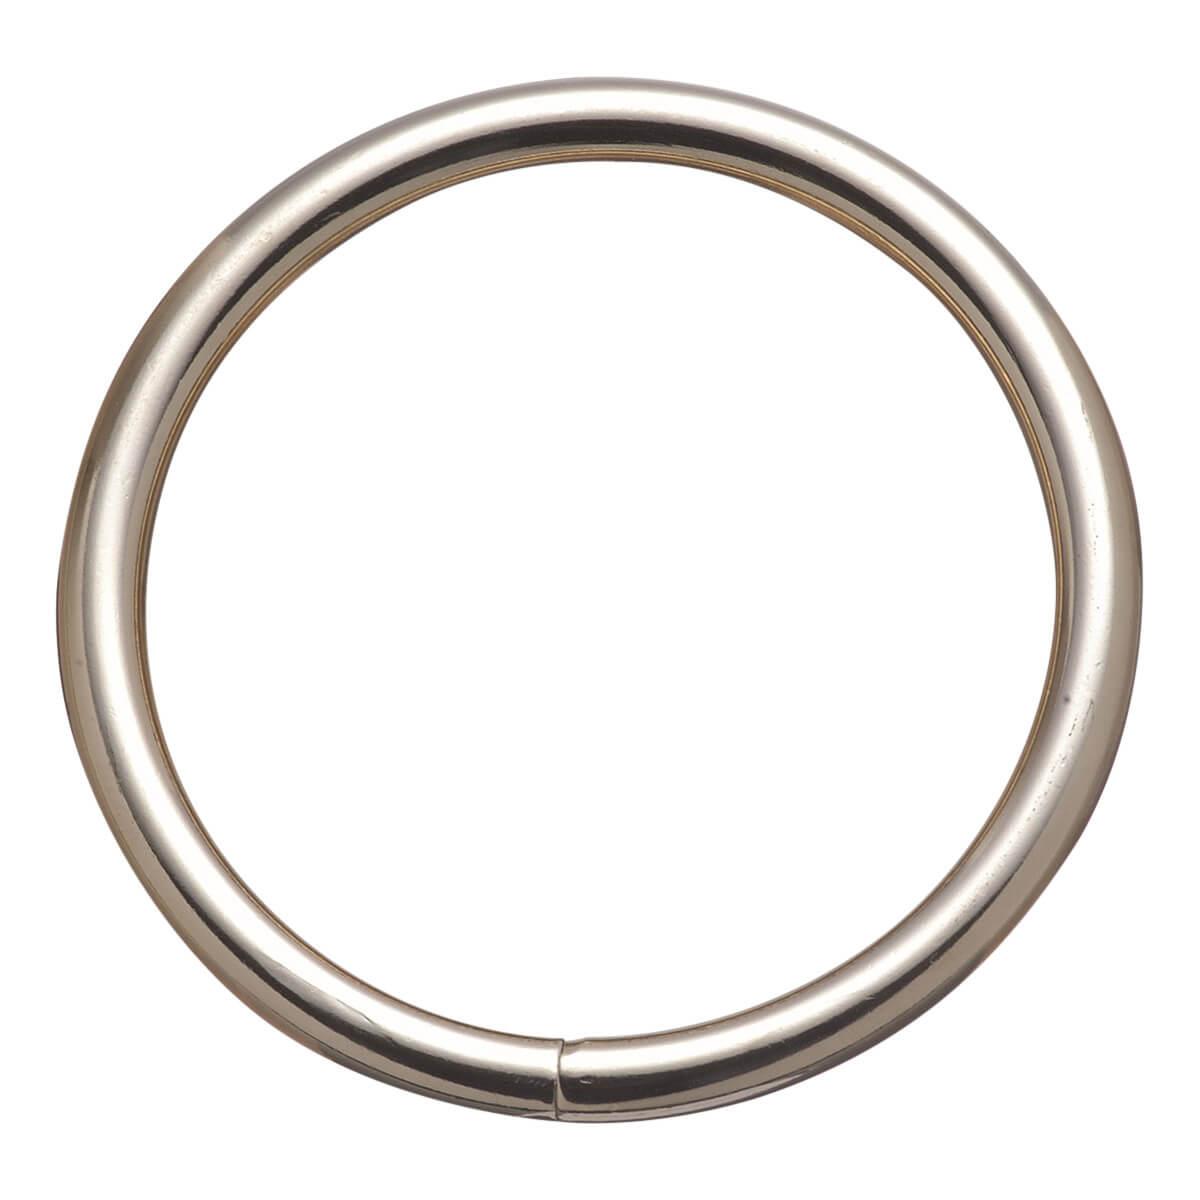 Harness Rings Welded - 1-in Nickel Plated